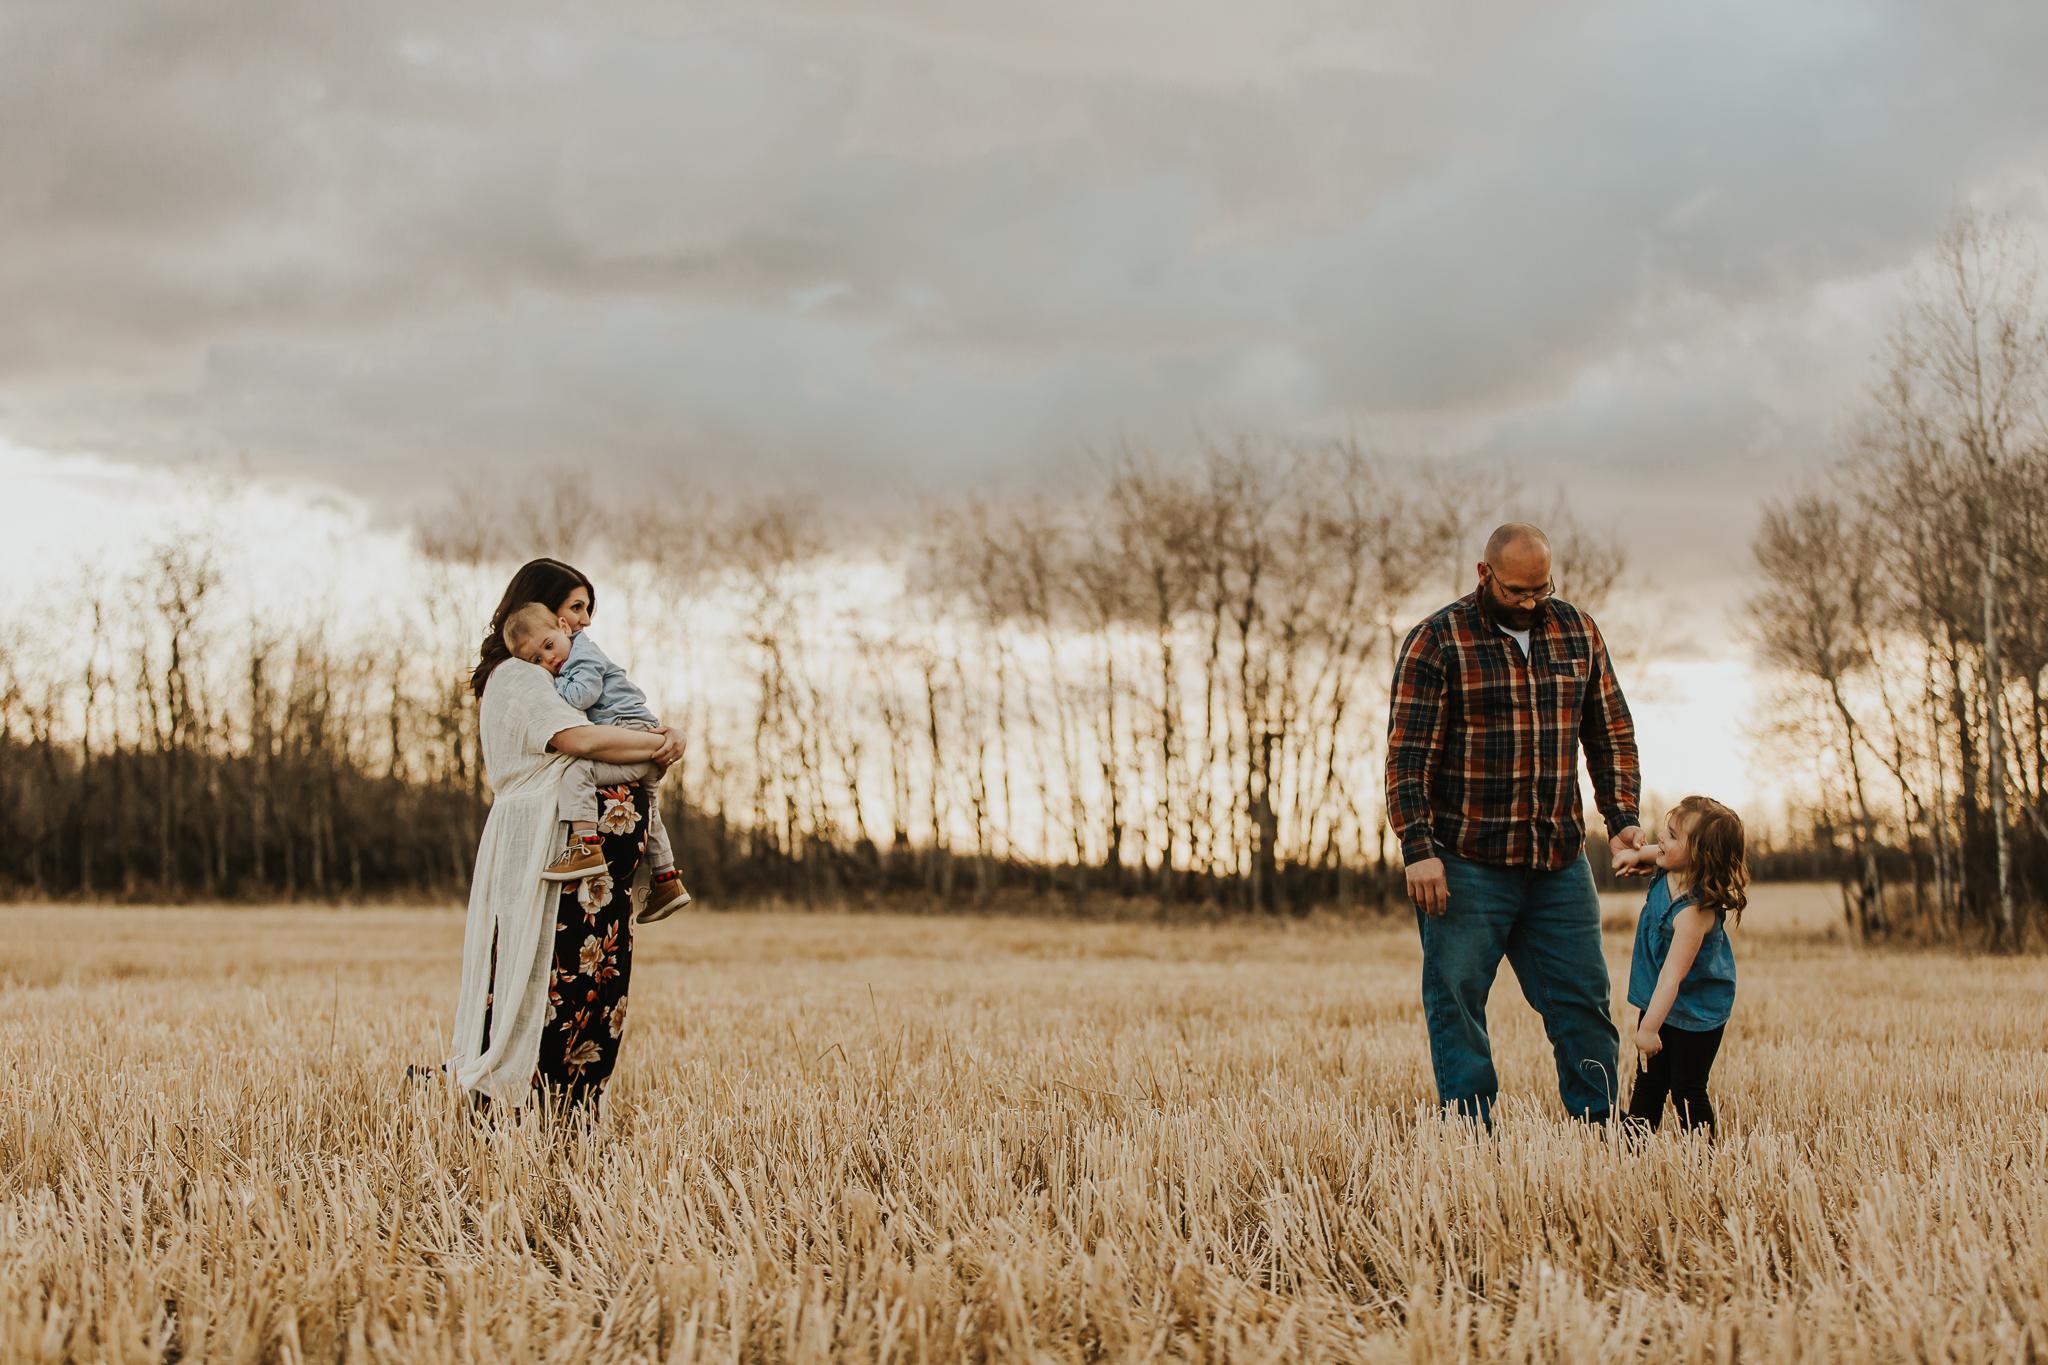 Alina-Joy-Photography-Cold-Lake-Maternity-Photographer-Josee-25.jpg